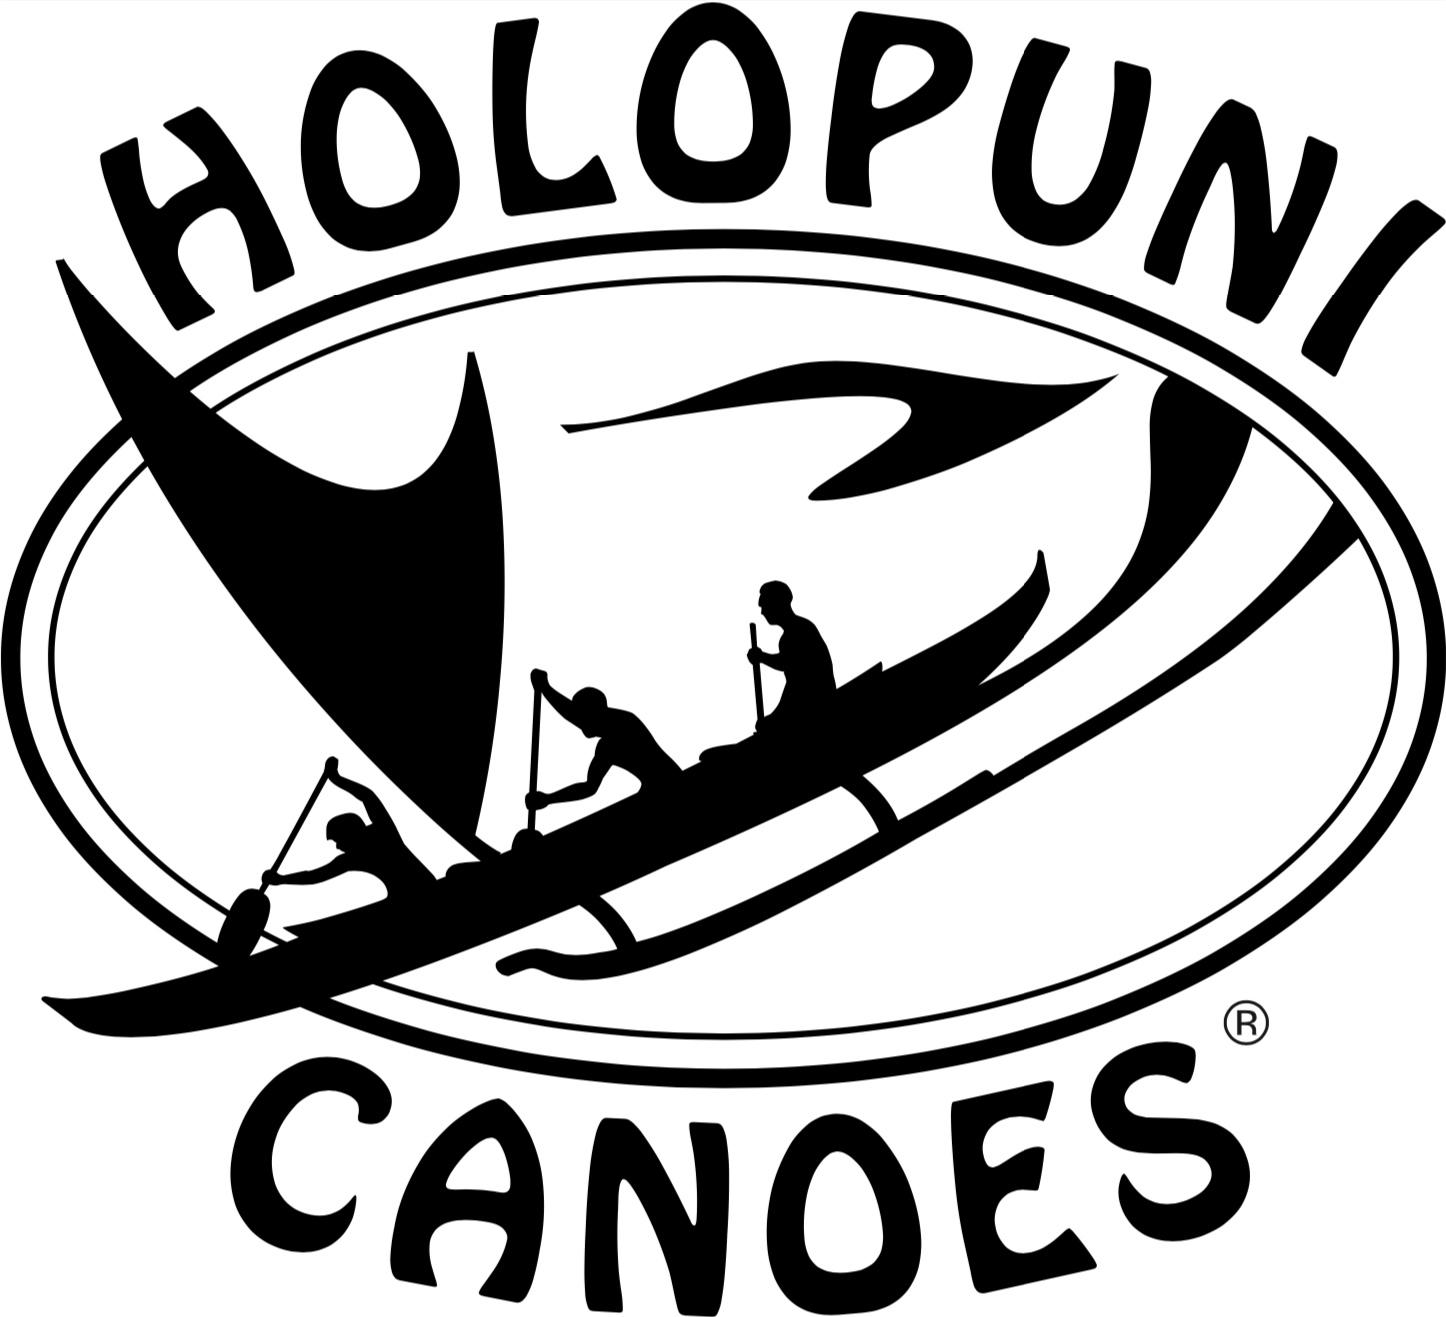 Holopuni+canoes.jpg